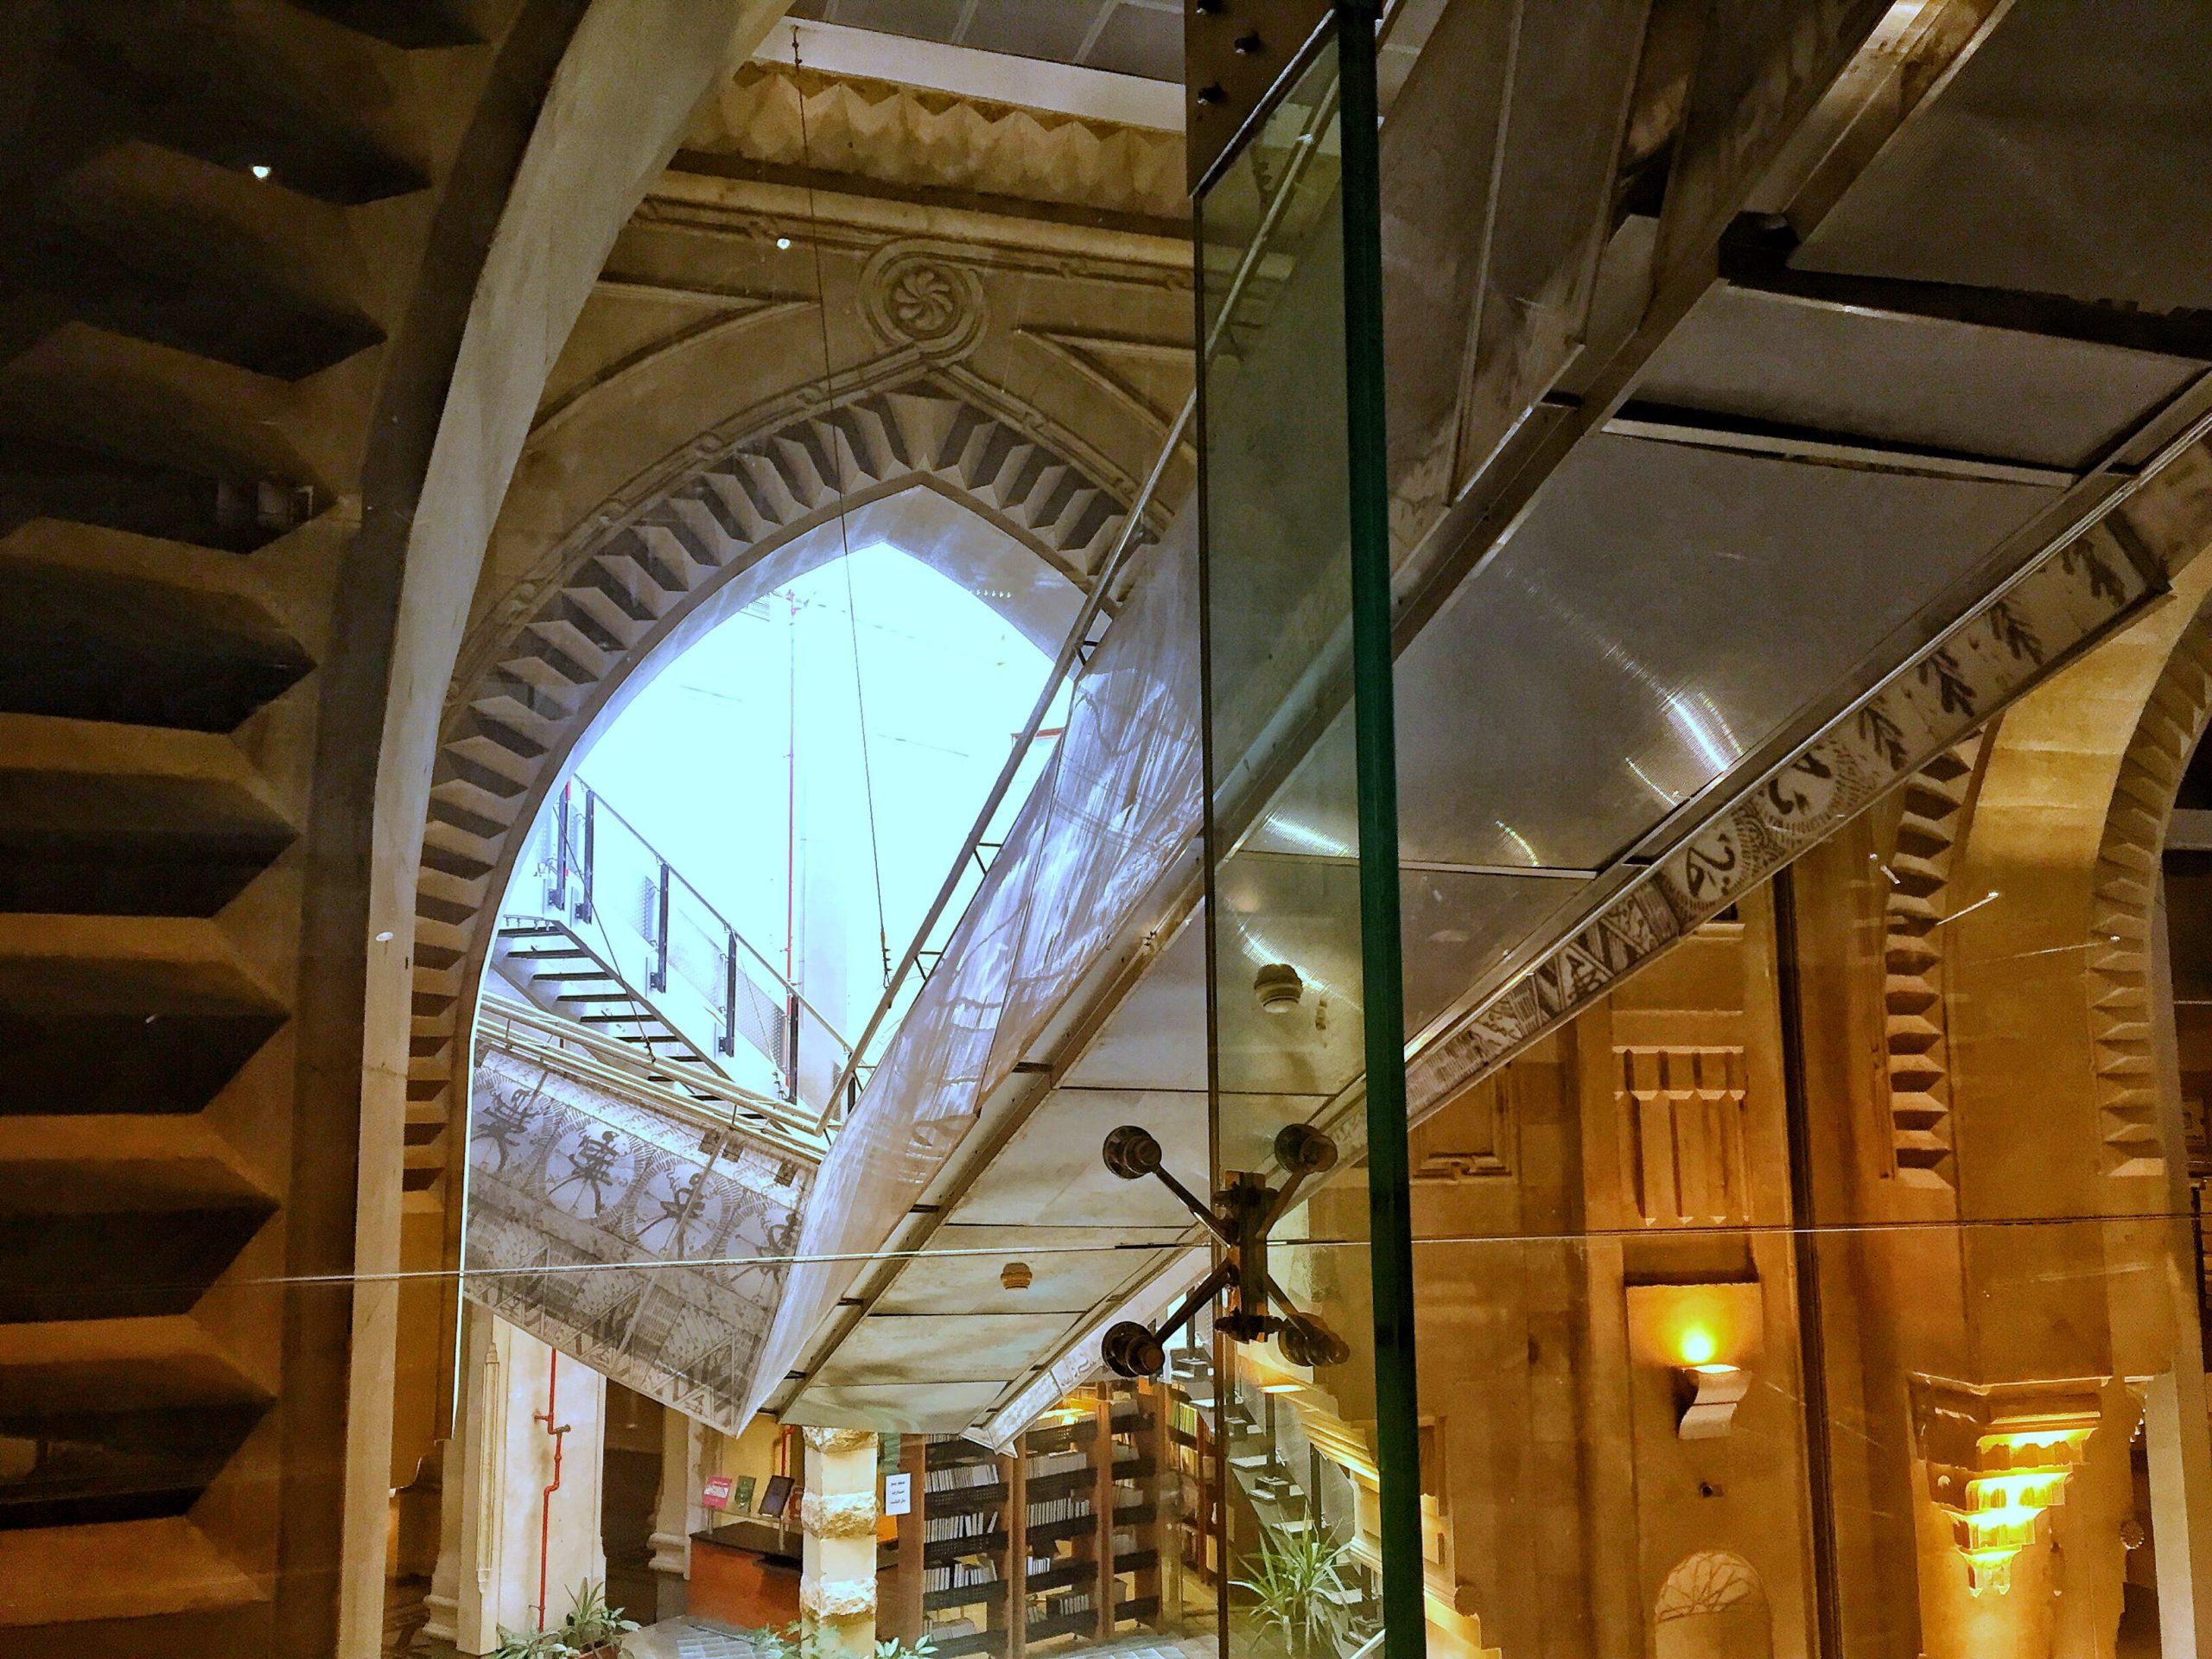 Die ägyptische Nationalbibliothek Dar al-Kutub